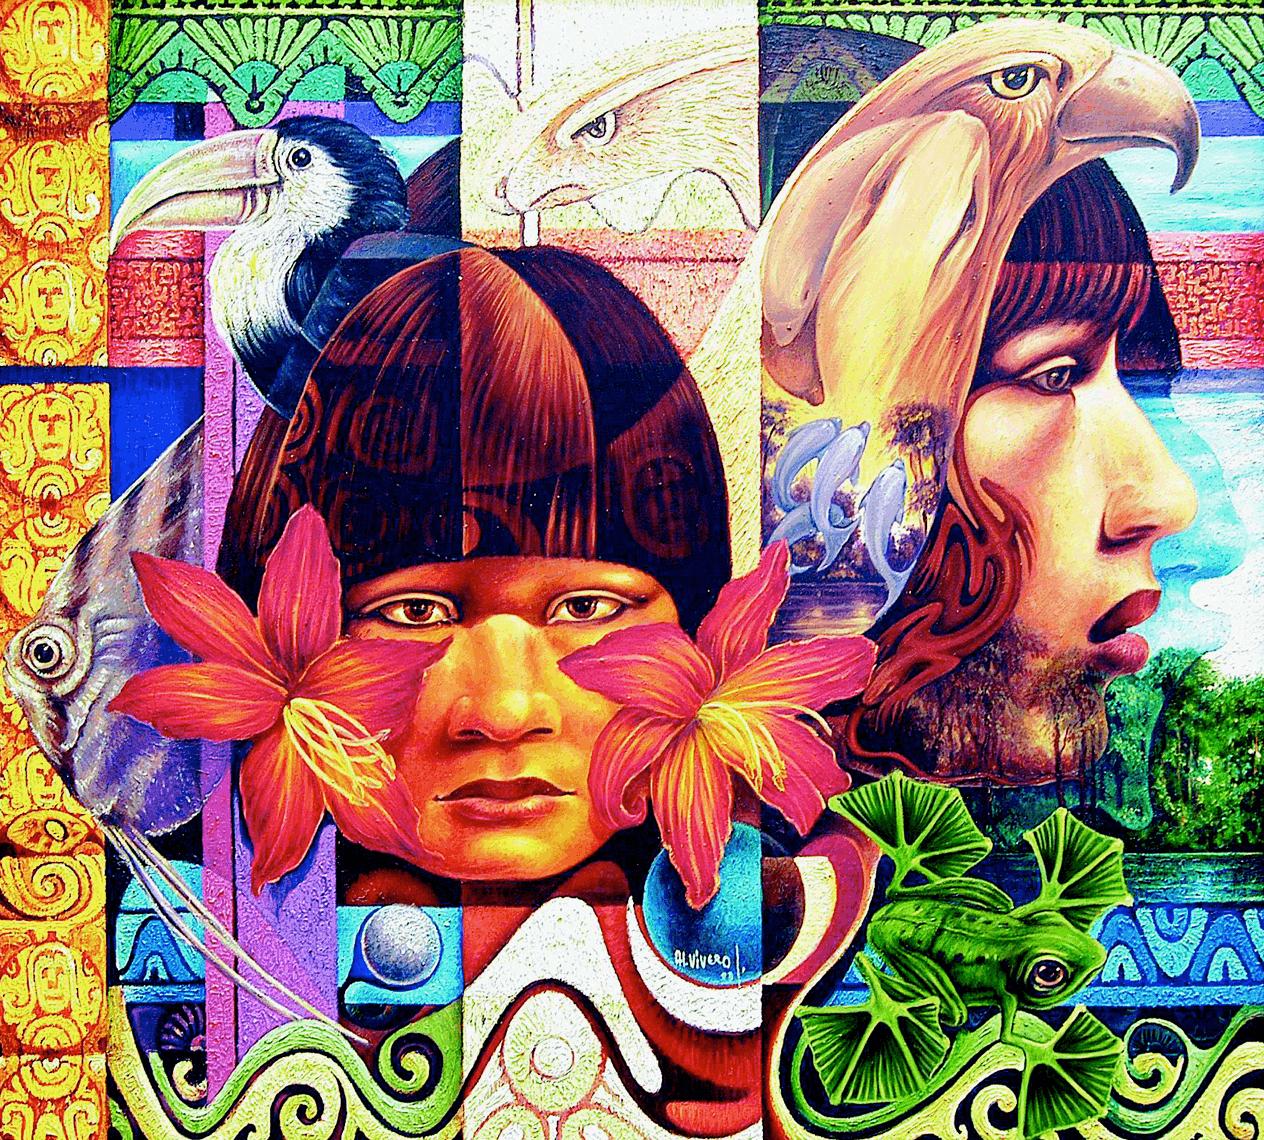 Alfredo Vivero, Espíritus femeninos del Amazonas, 1993.